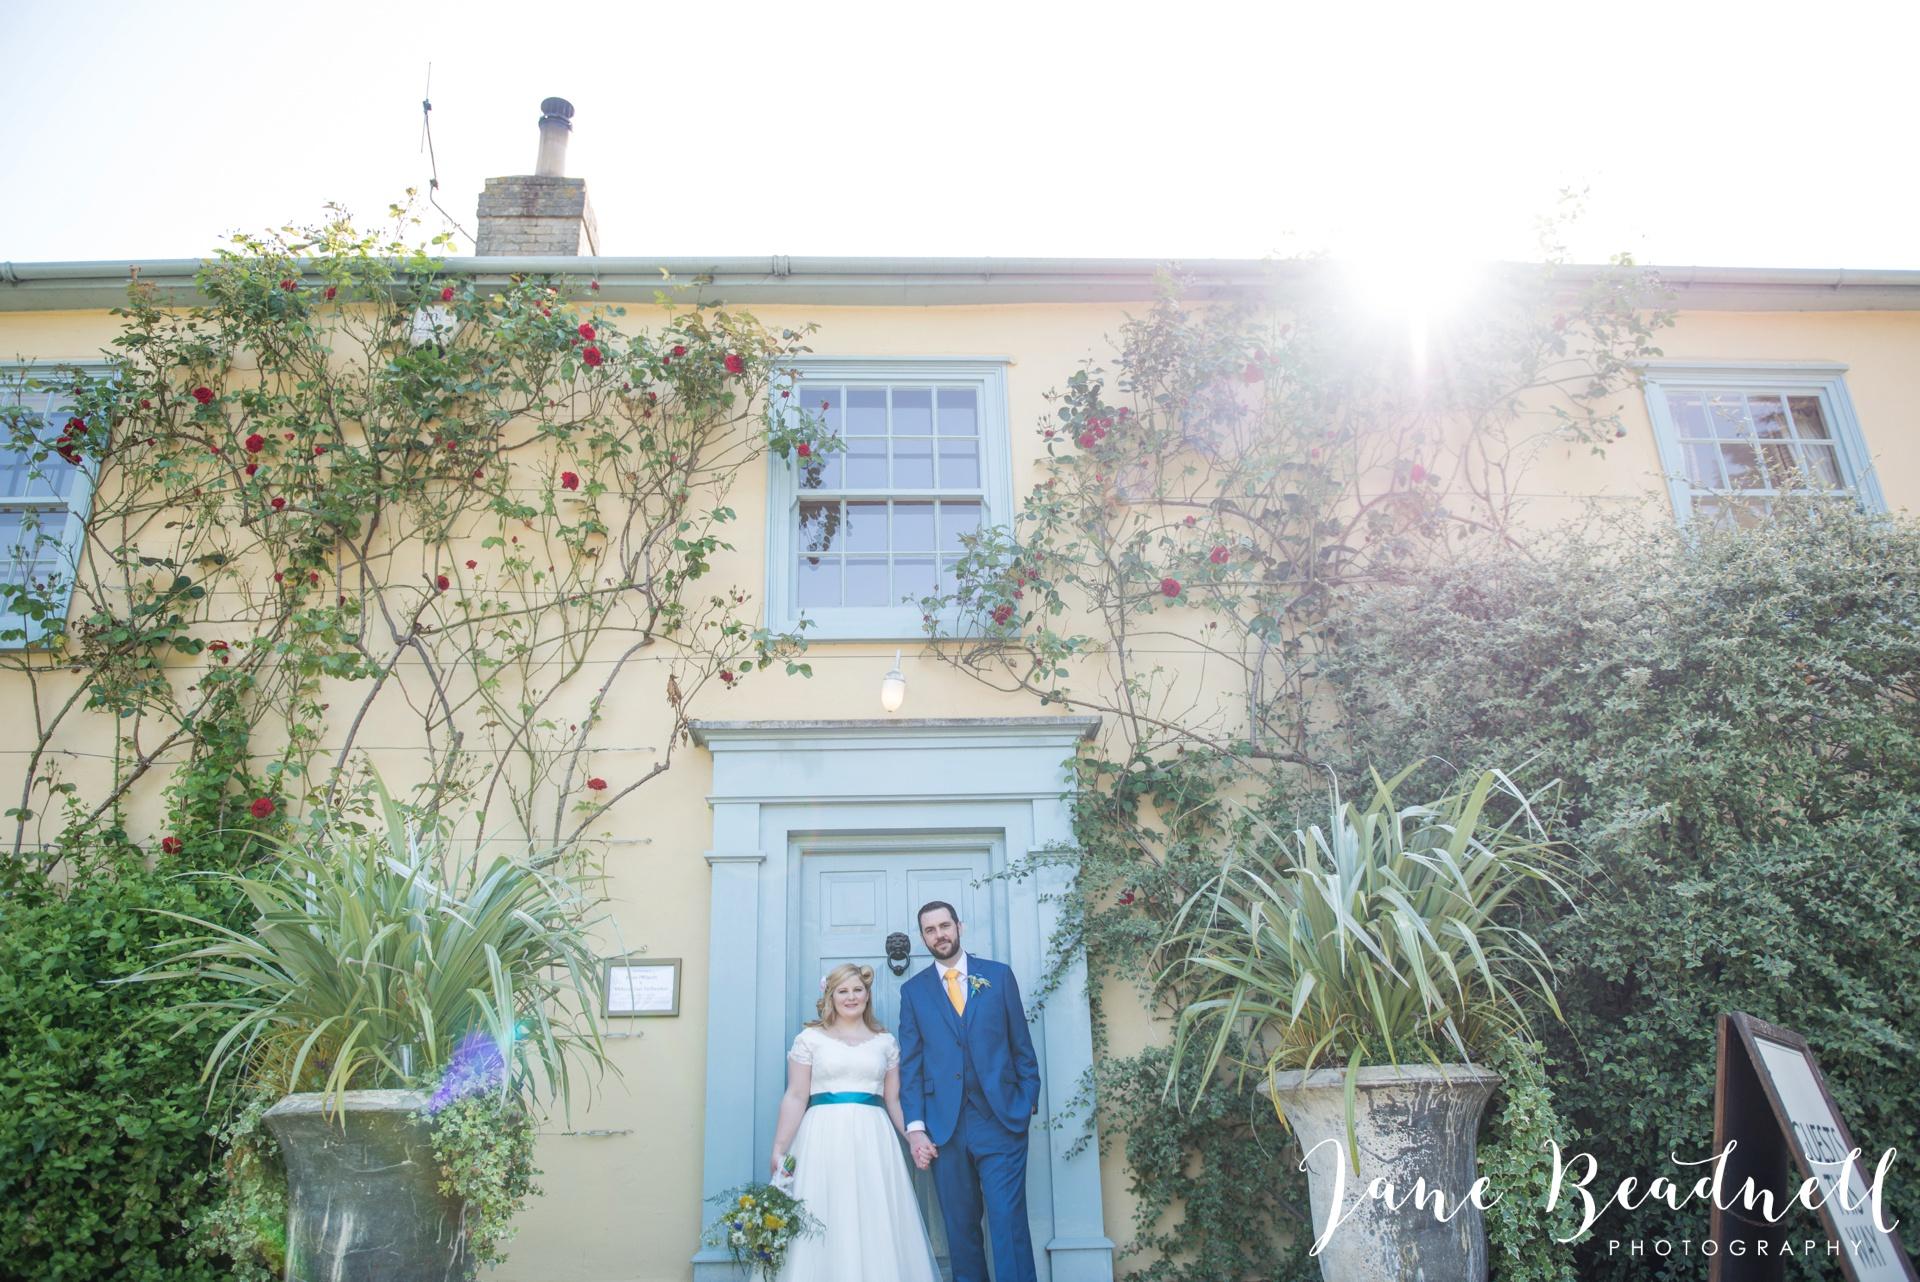 South Farm Wedding photography Hertfordshire by Jane Beadnell Photography fine art wedding photographer_0138